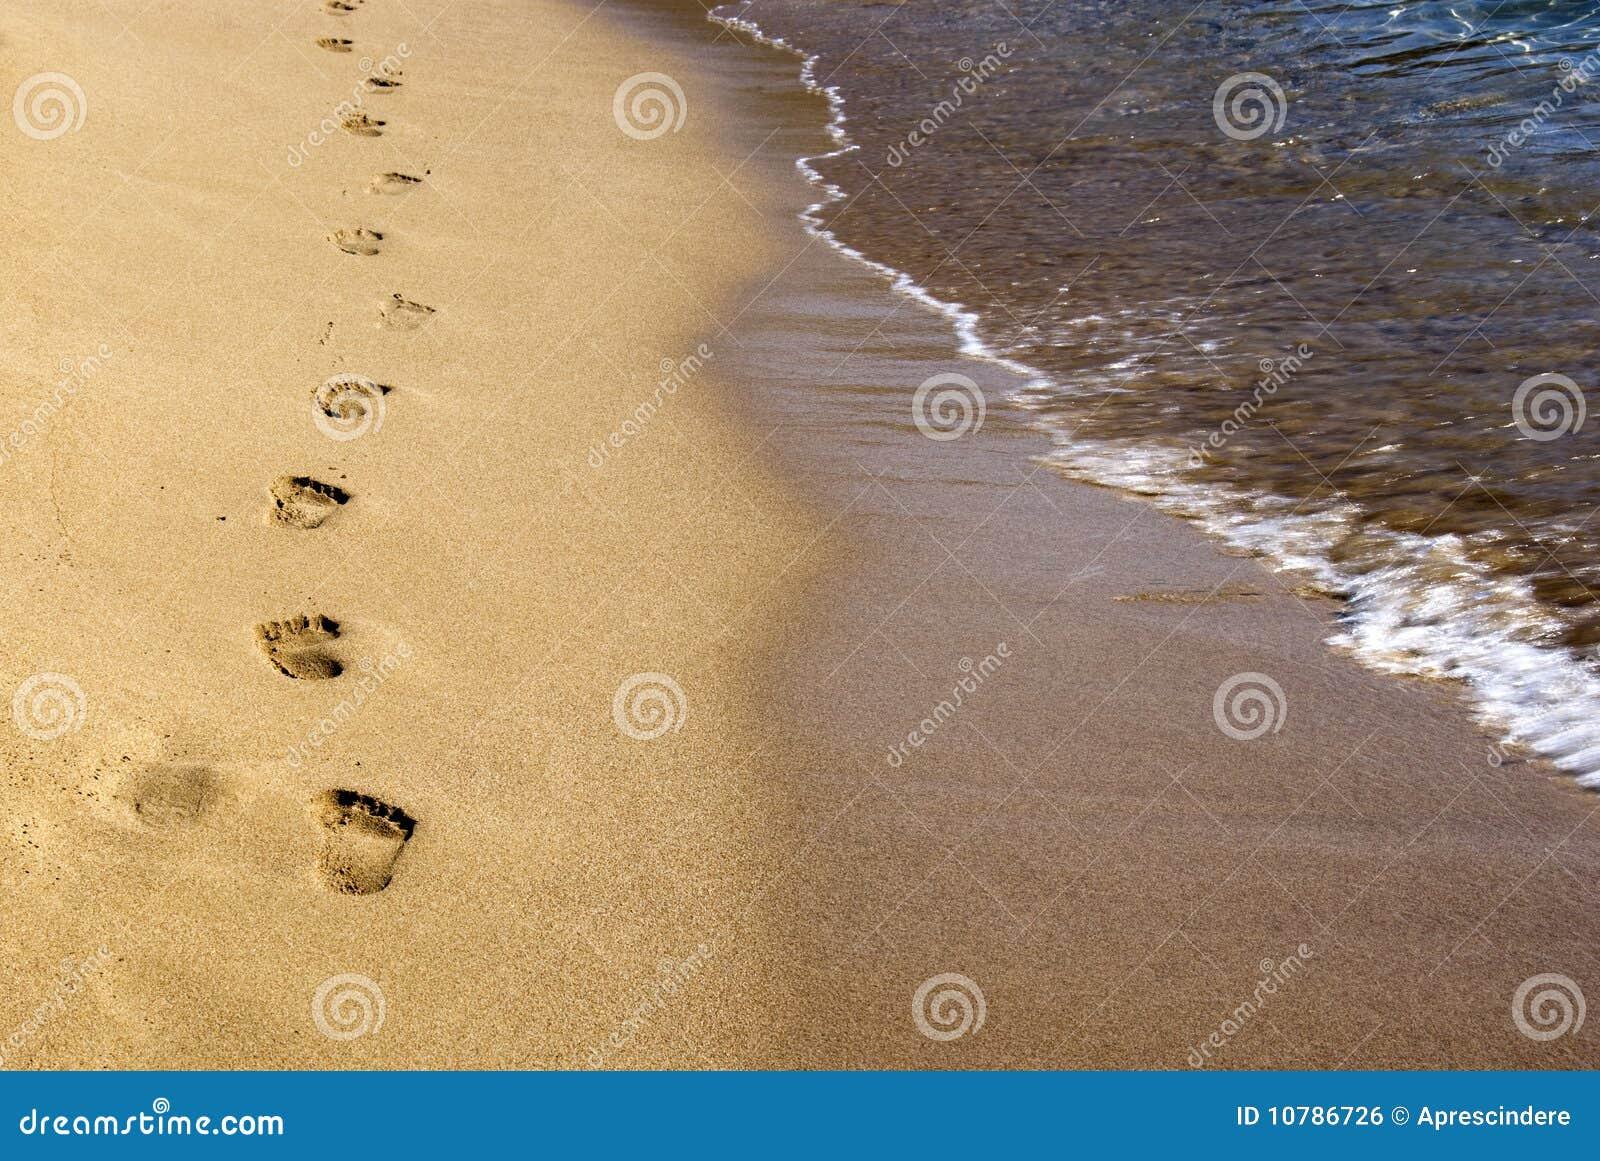 Footprints on the sand